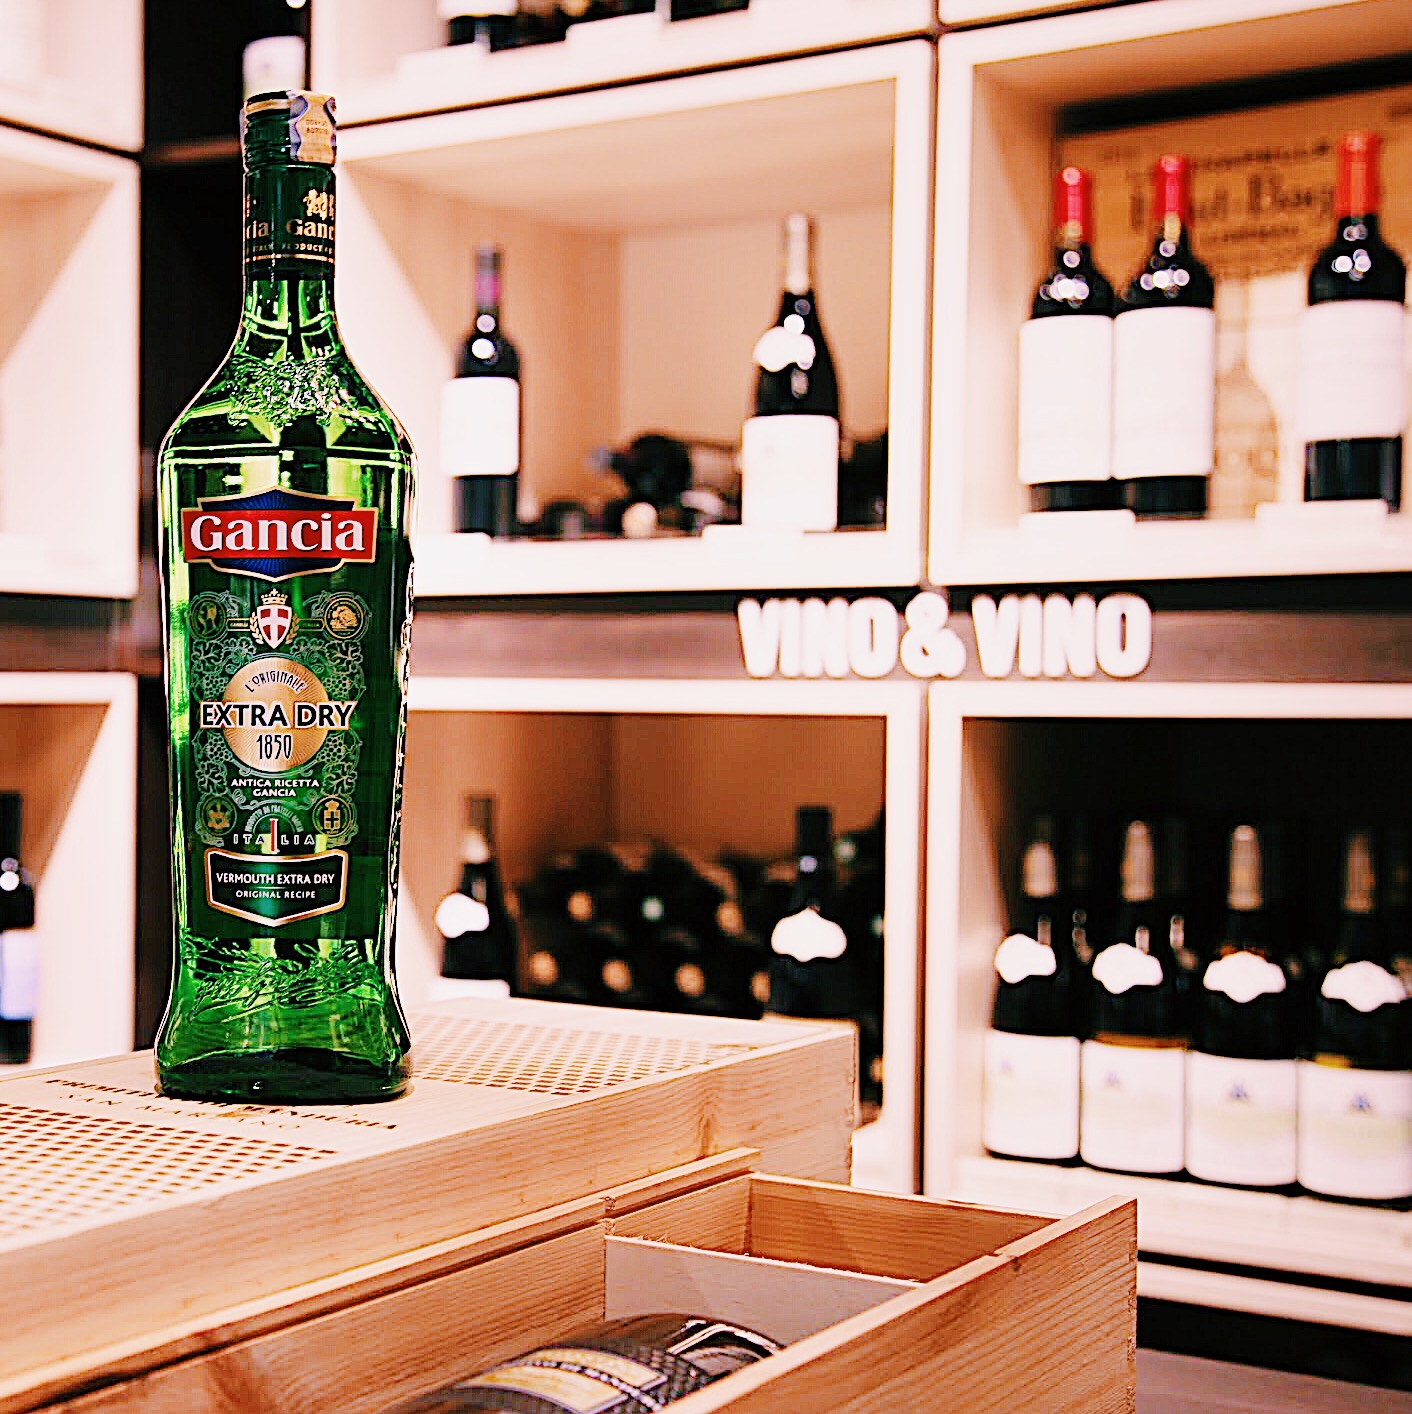 Gancia Vermouth Extra Dry